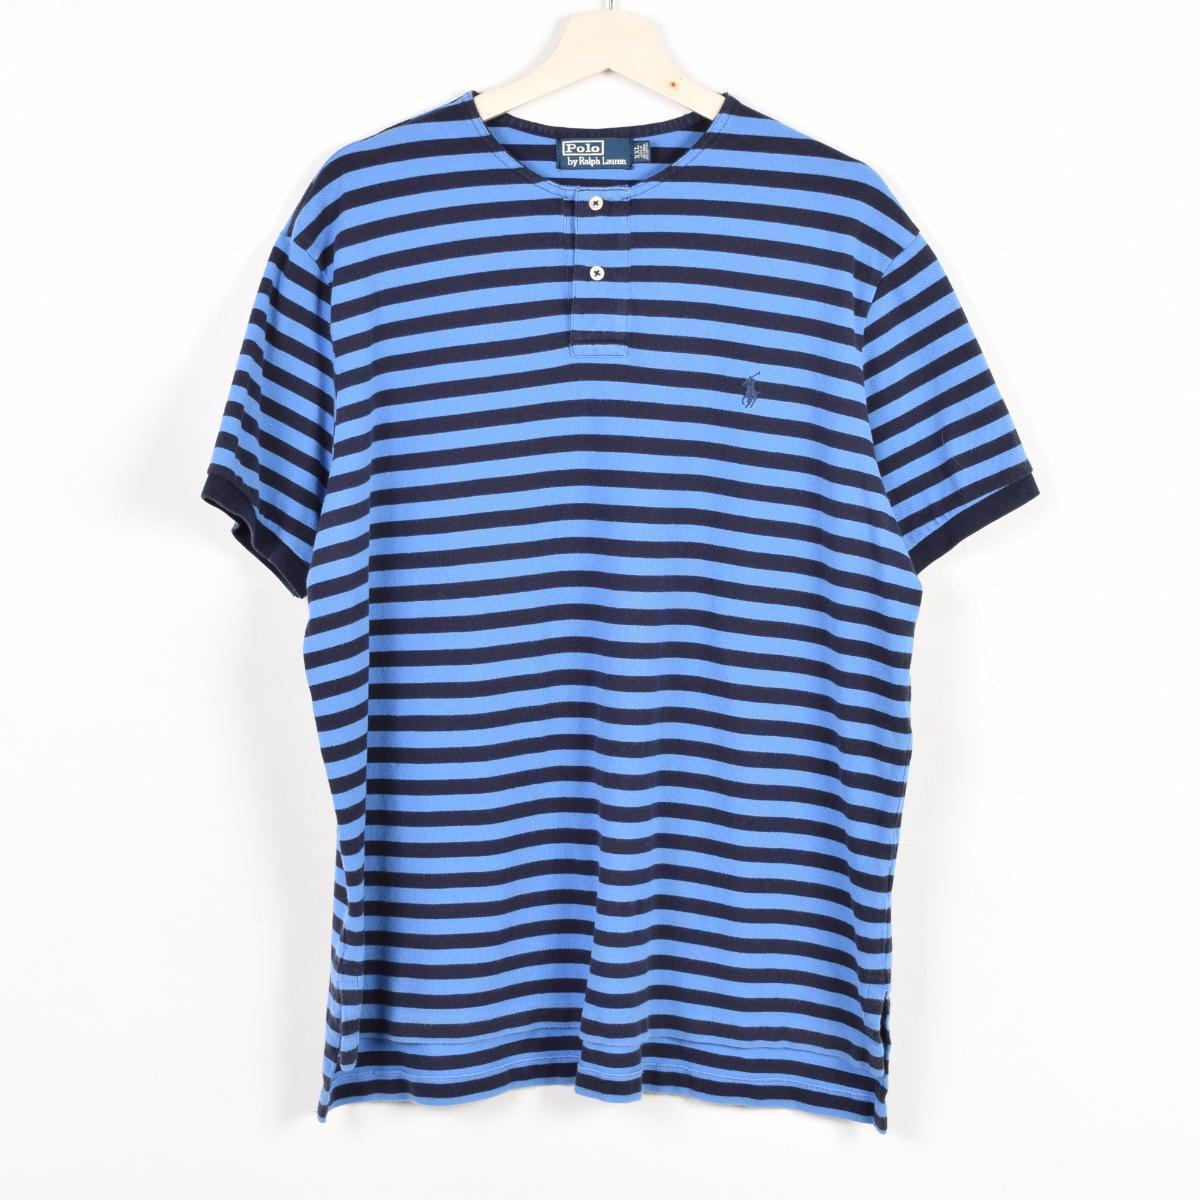 VINTAGE CLOTHING JAM TRADING | Rakuten Global Market: JAM remake Ralph Lauren POLO by Ralph Lauren border pattern short sleeve now color polo shirt mens XXL ...